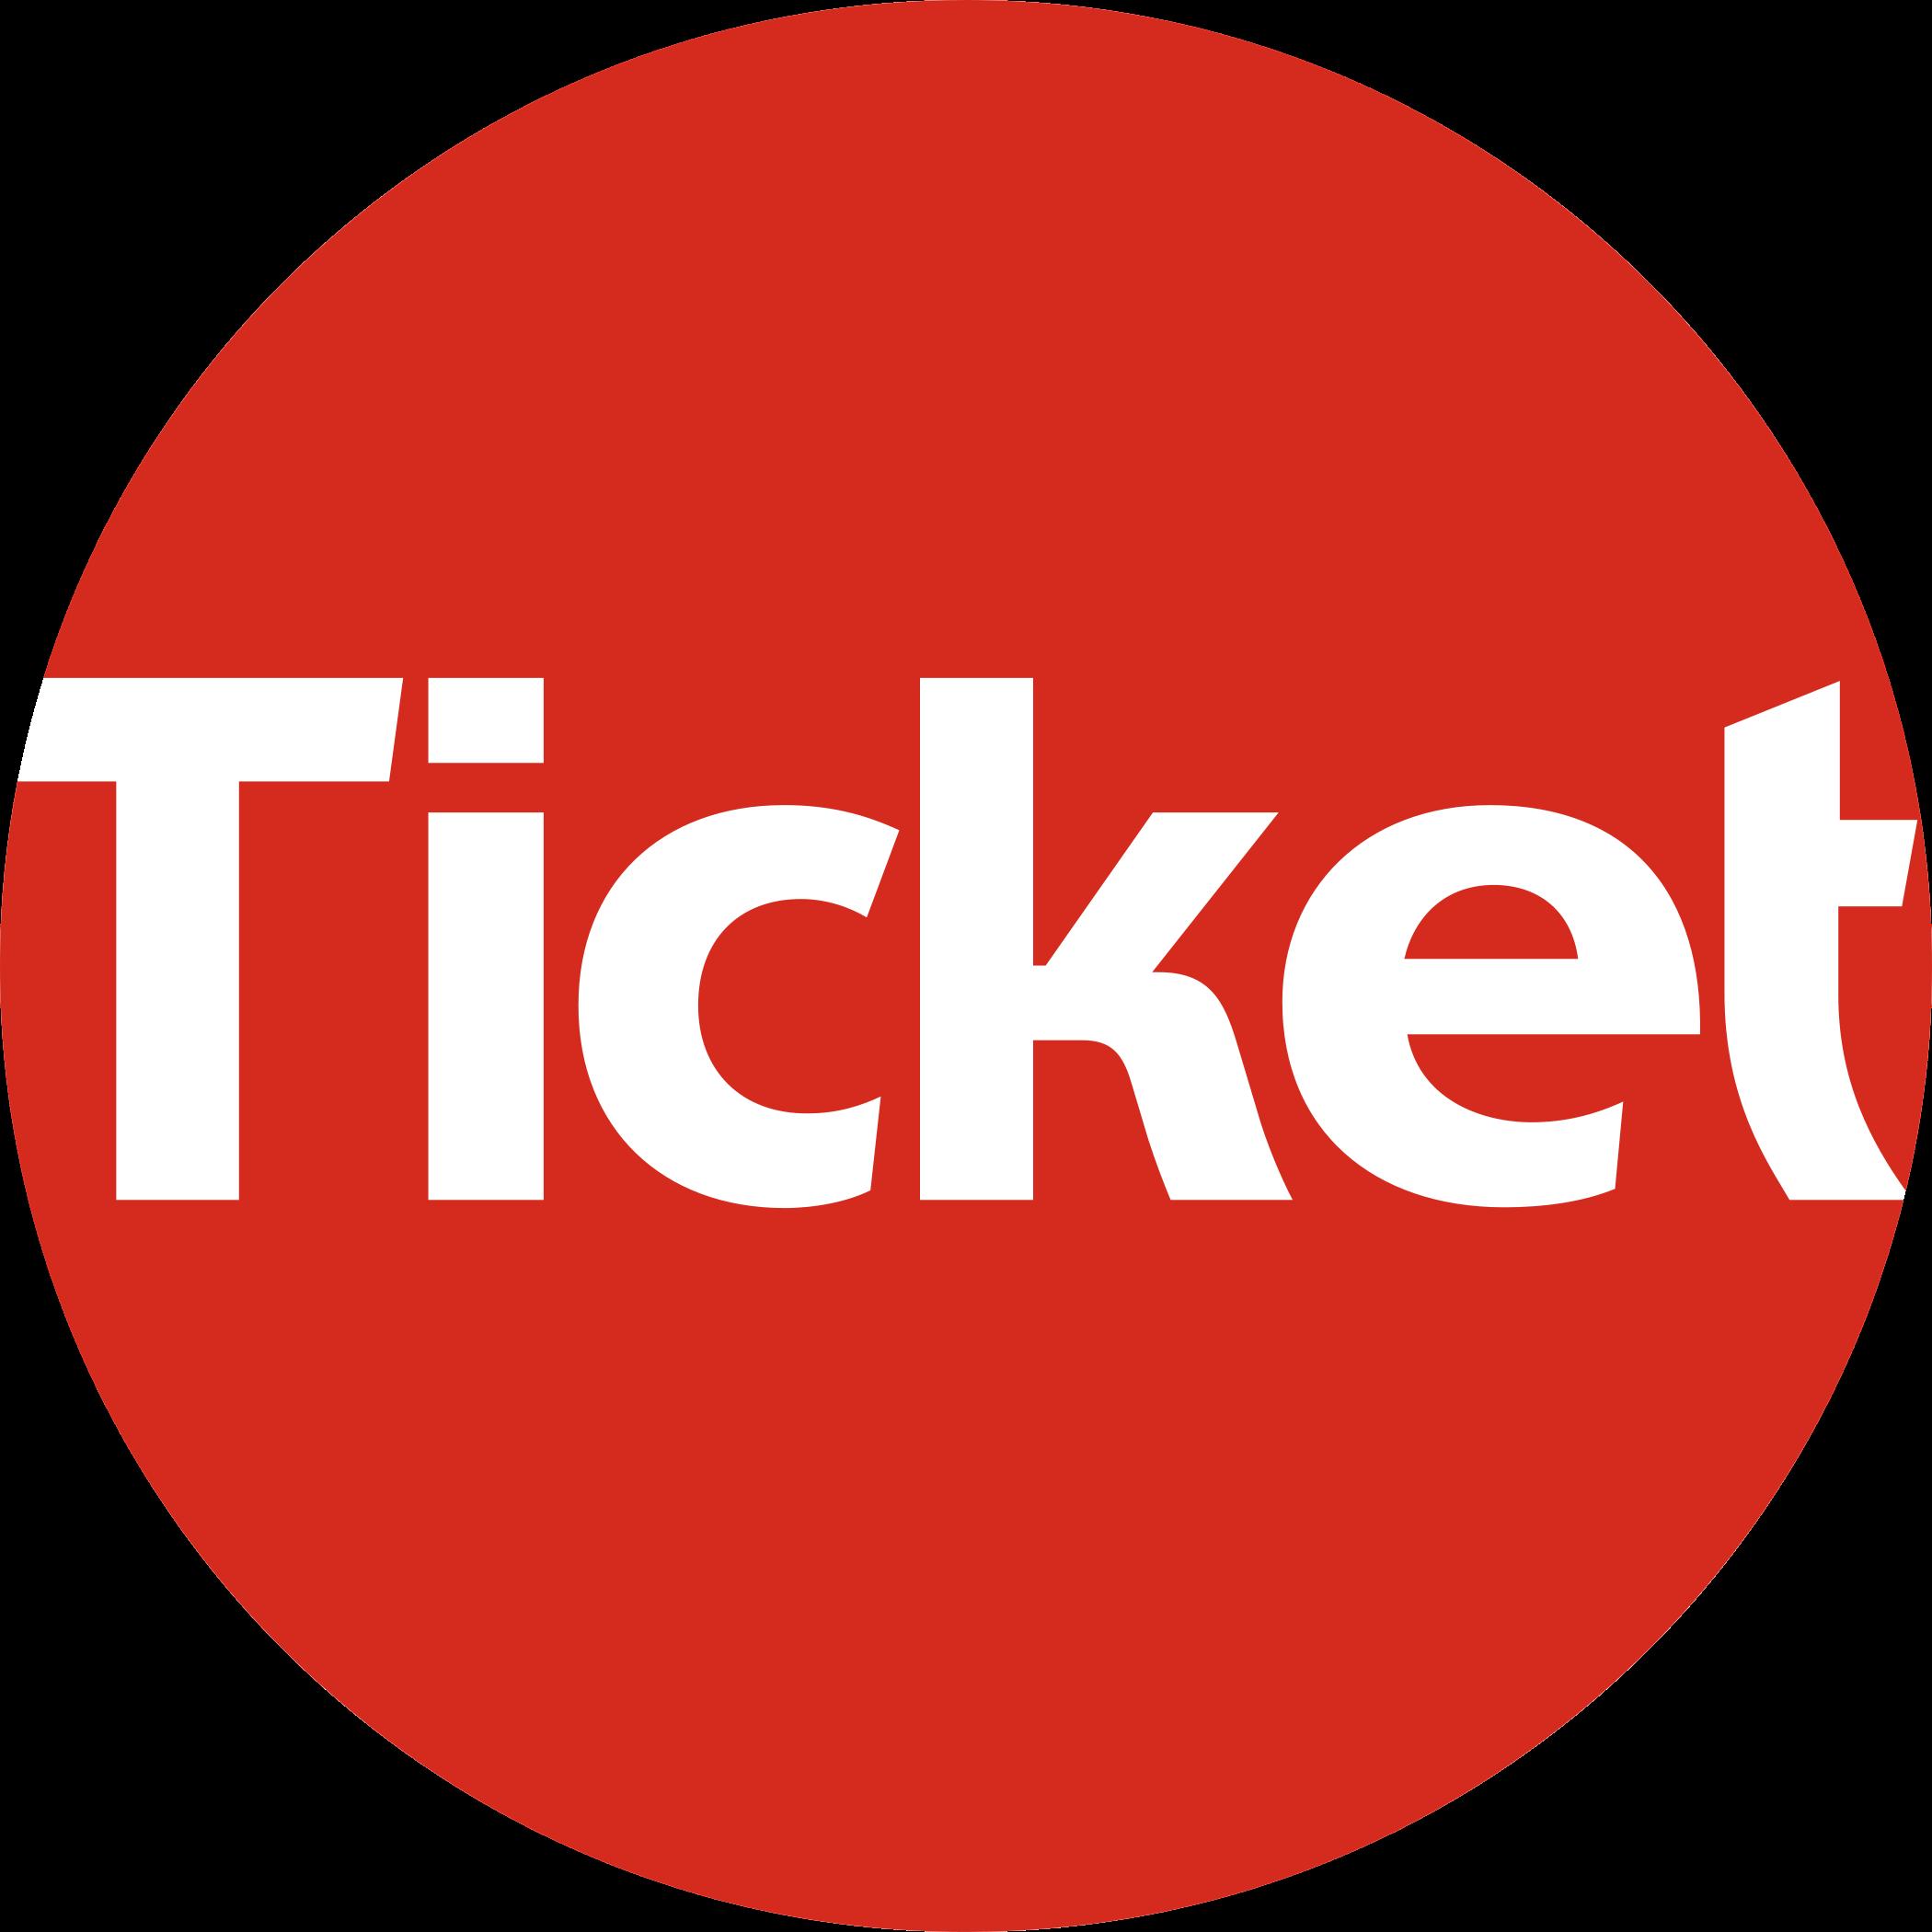 ticket-logo-2